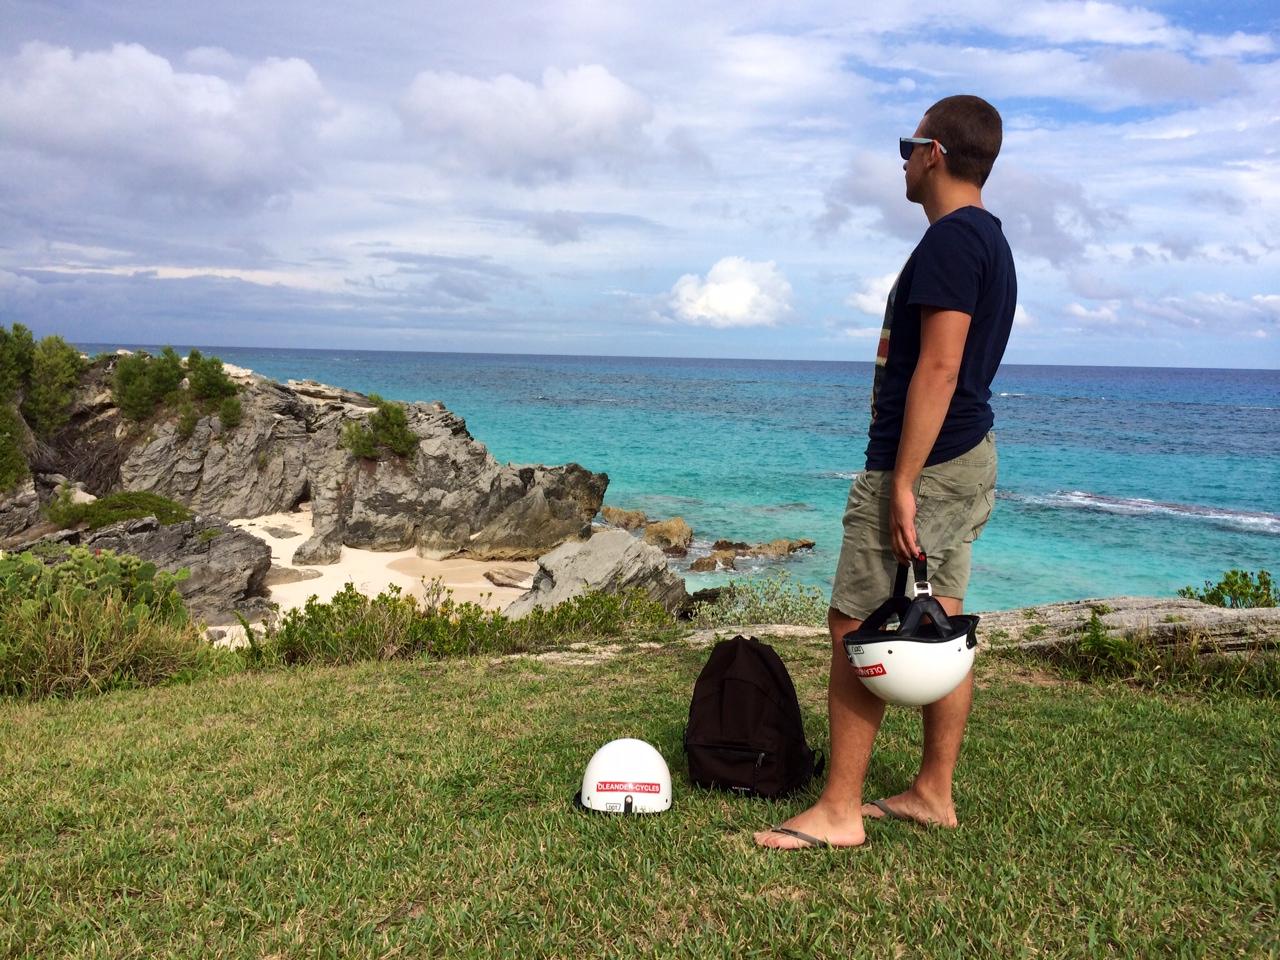 Bermuda - l'isola da girare in motorino